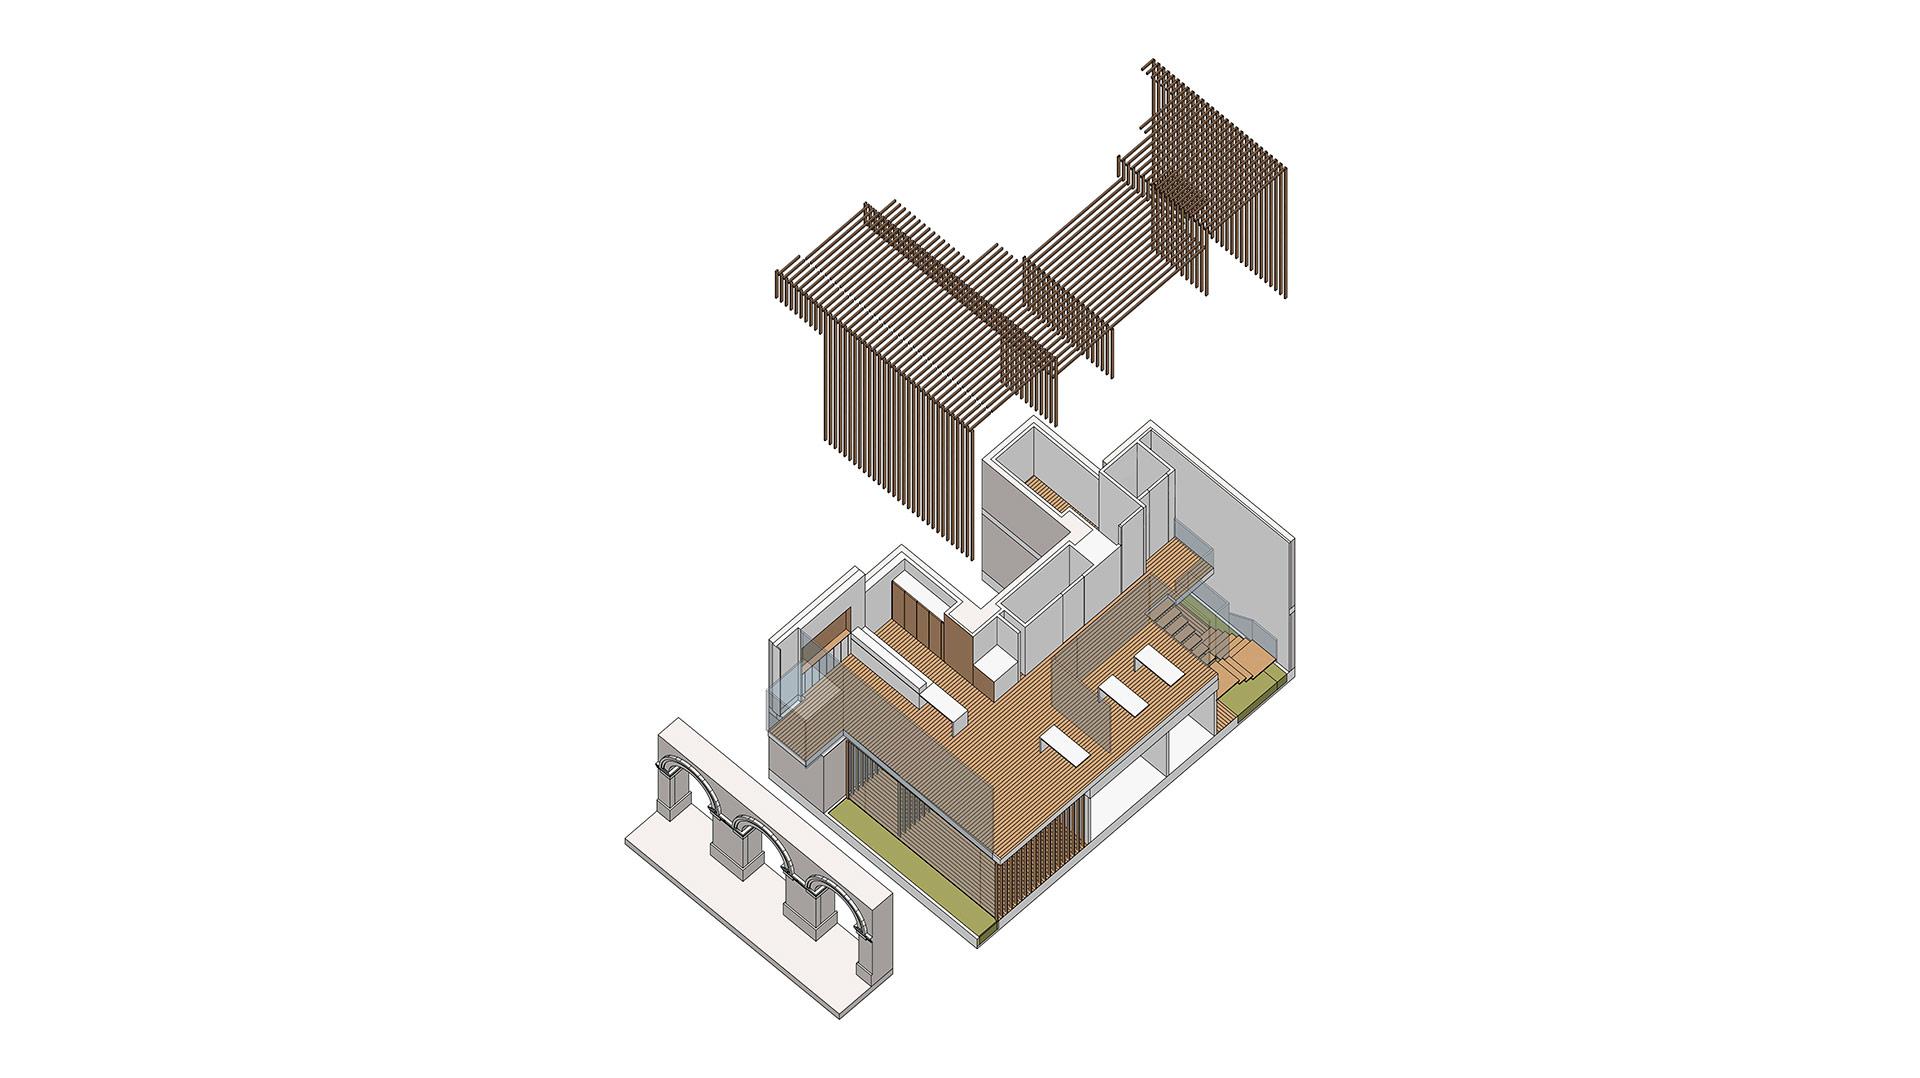 Concurso-oficina-Arquia-Proyecto-ByEarquitectos-Pamplona-Navarra-00-Portada